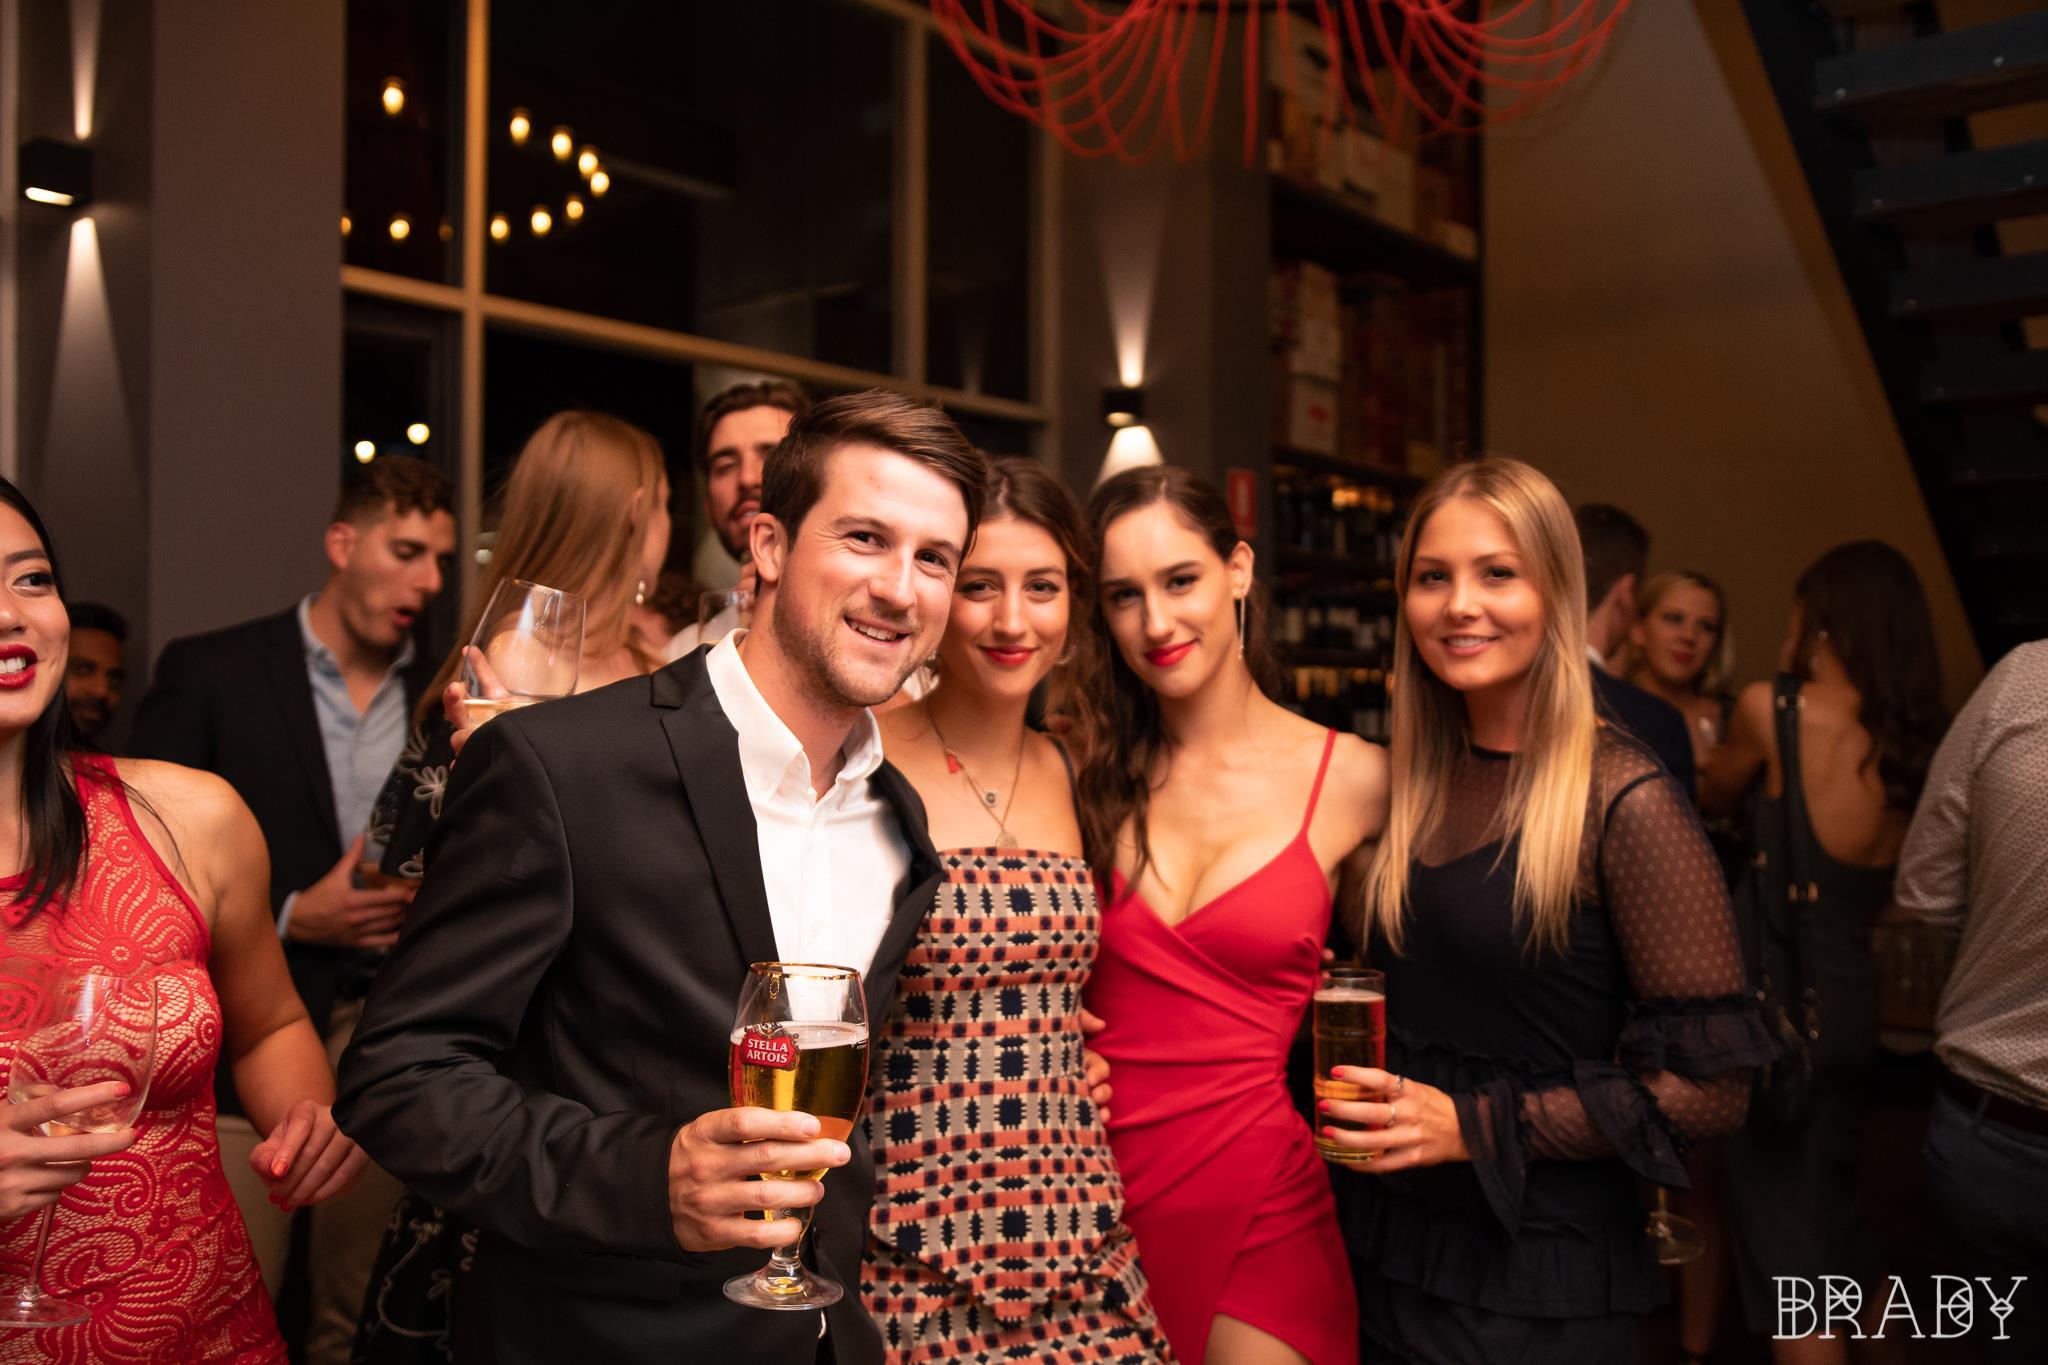 Fremantle event space